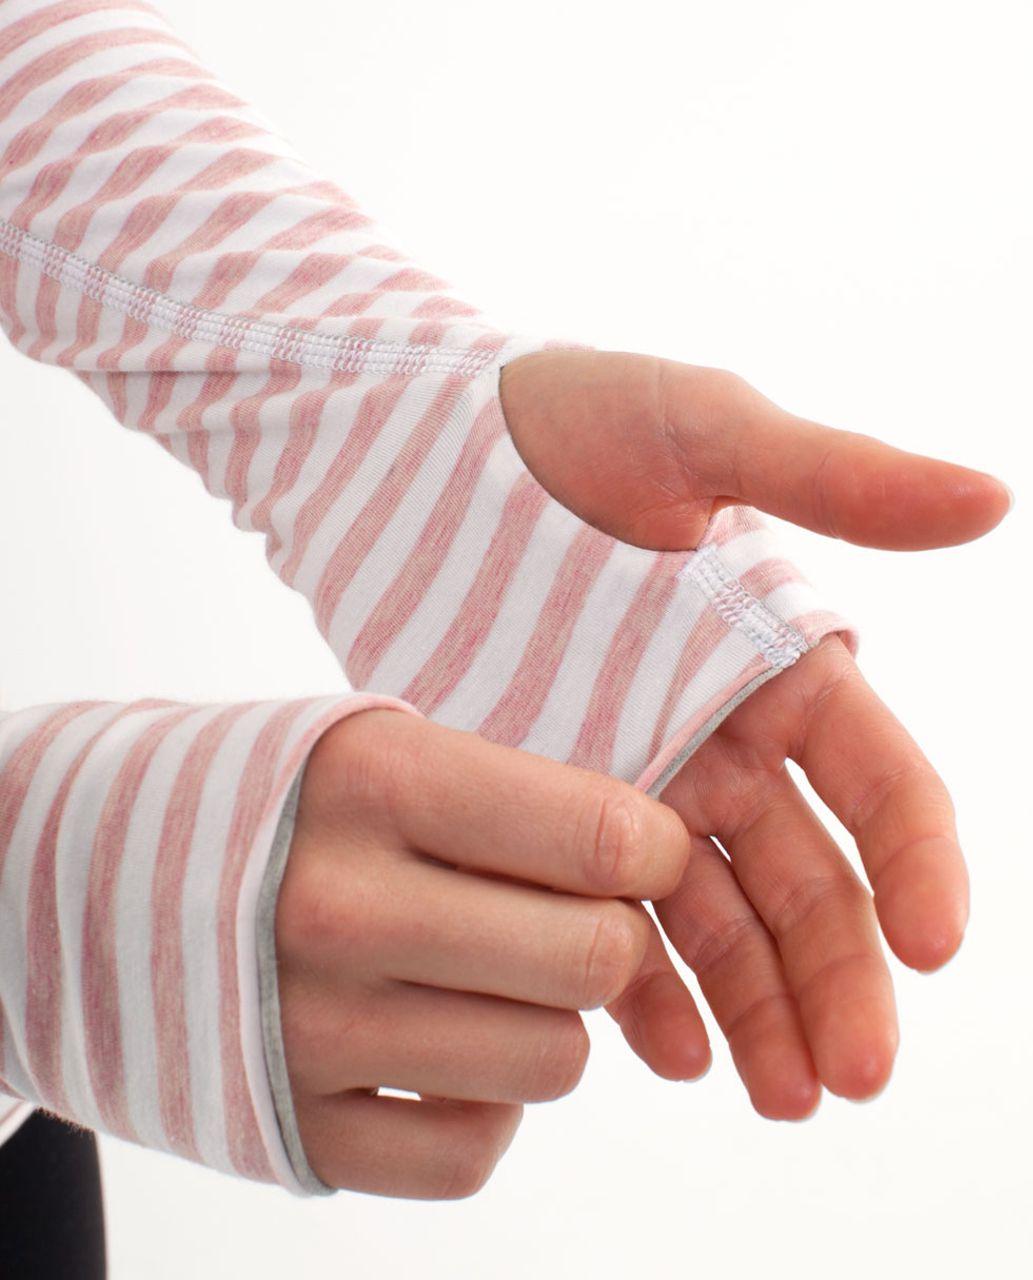 Lululemon Cabin Long Sleeve Tee II - Heathered Pig Pink White Narrow Bold Multi Stripe /  Heathered Silver Spoon